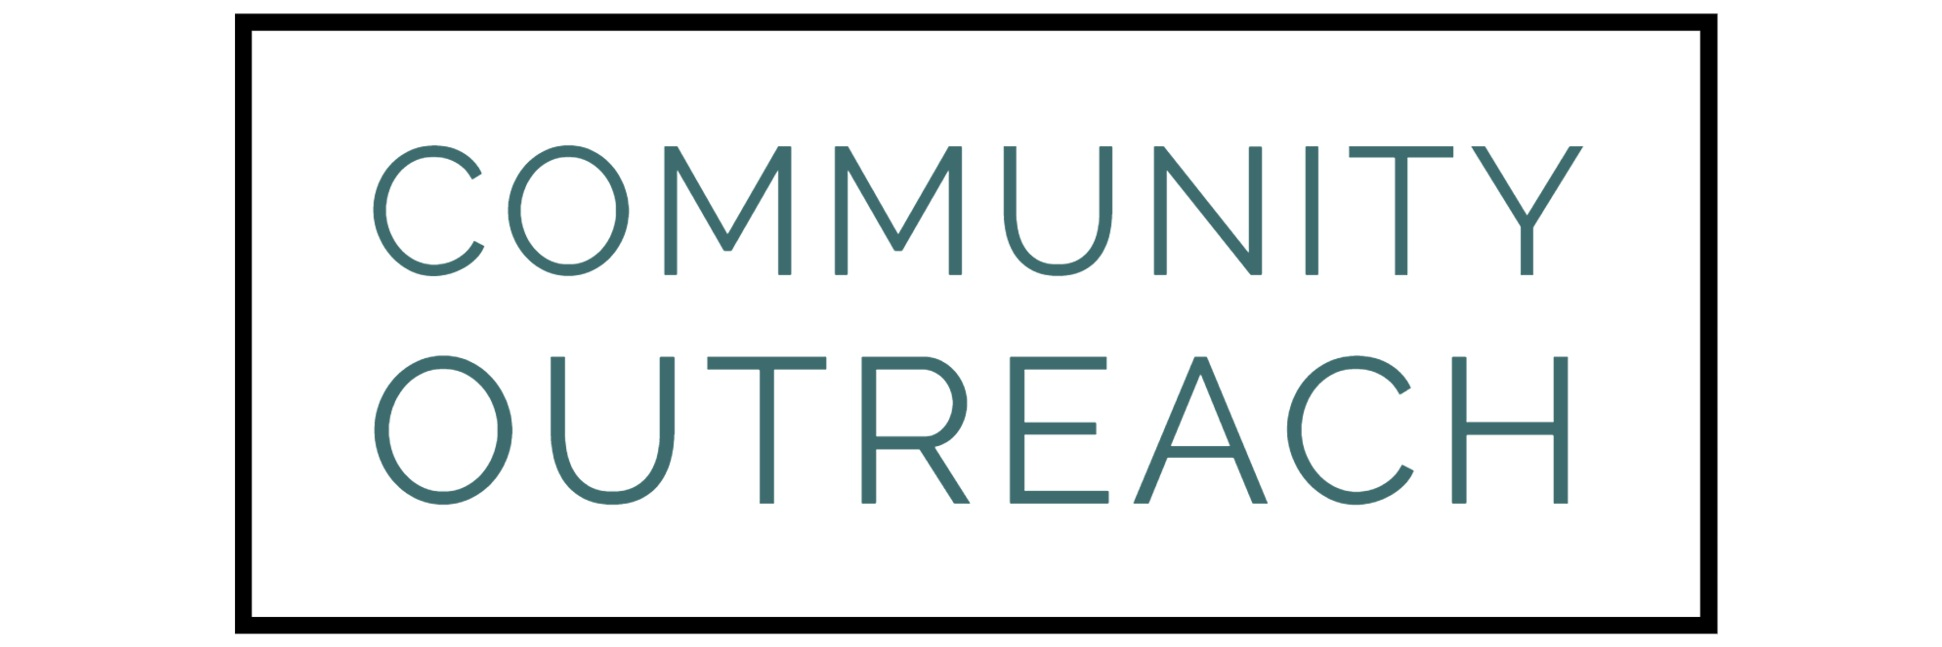 Community+Outreach.jpg